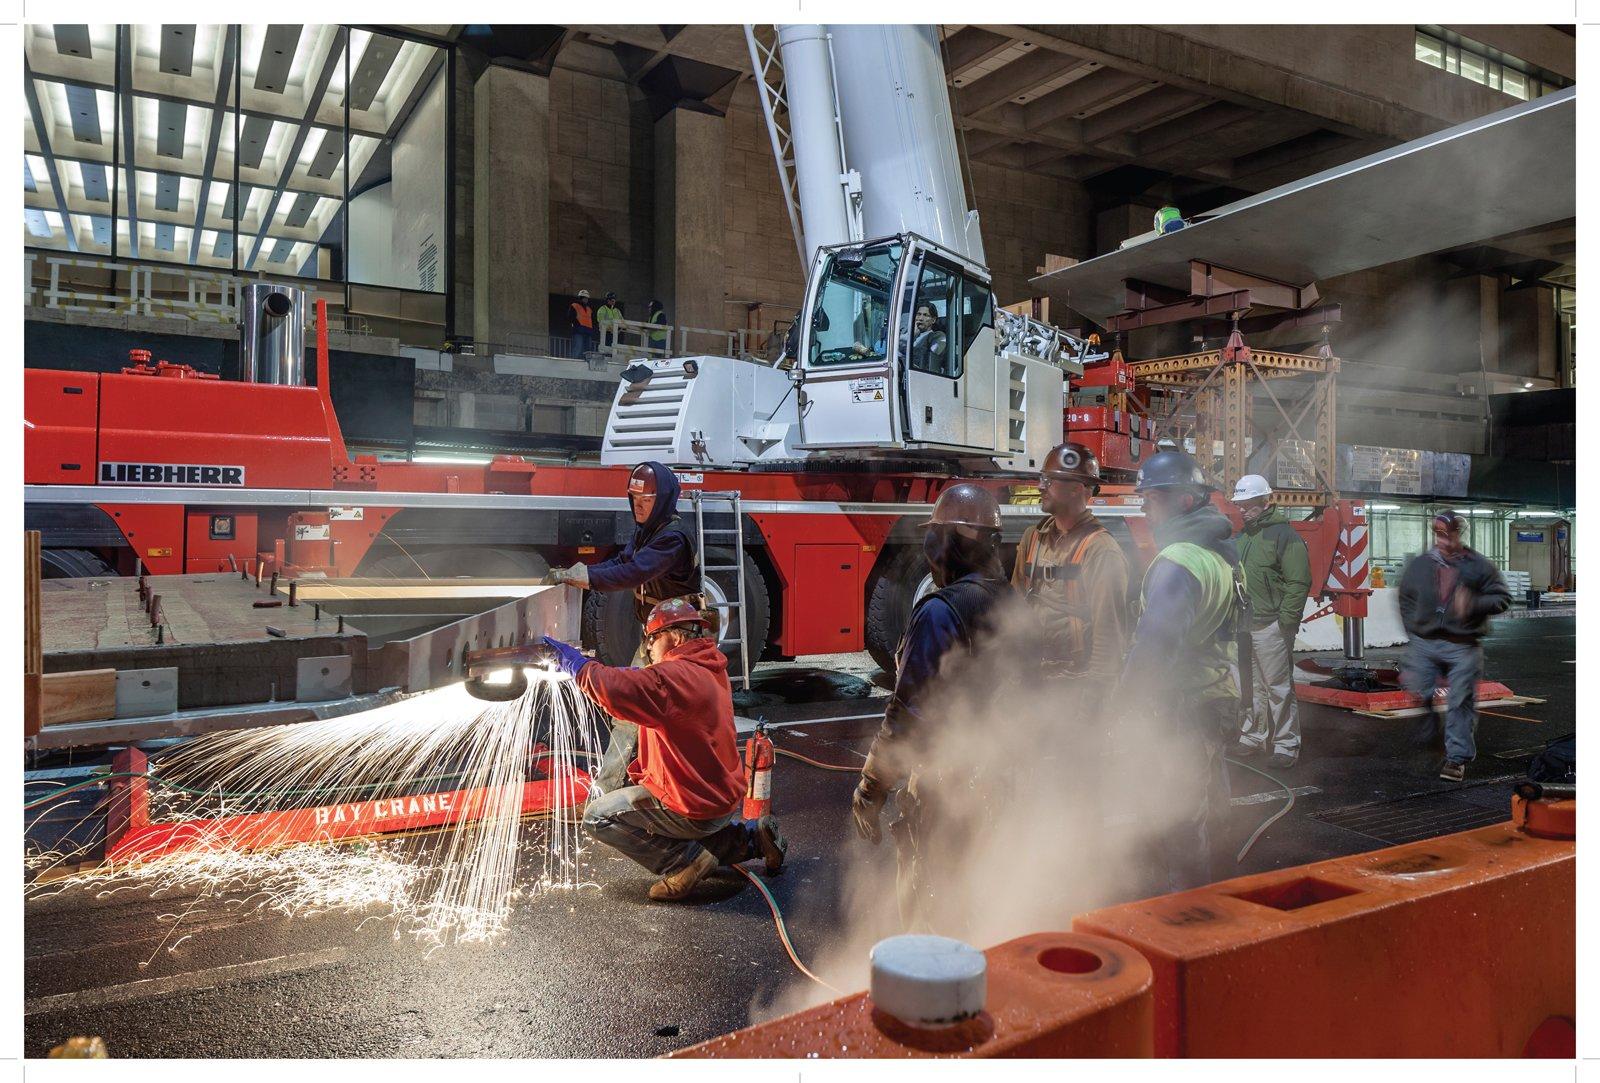 Pedestrian bridge installation, Matthew Monteith, 2012  Lincoln Center Inside Out by Aaron Britt